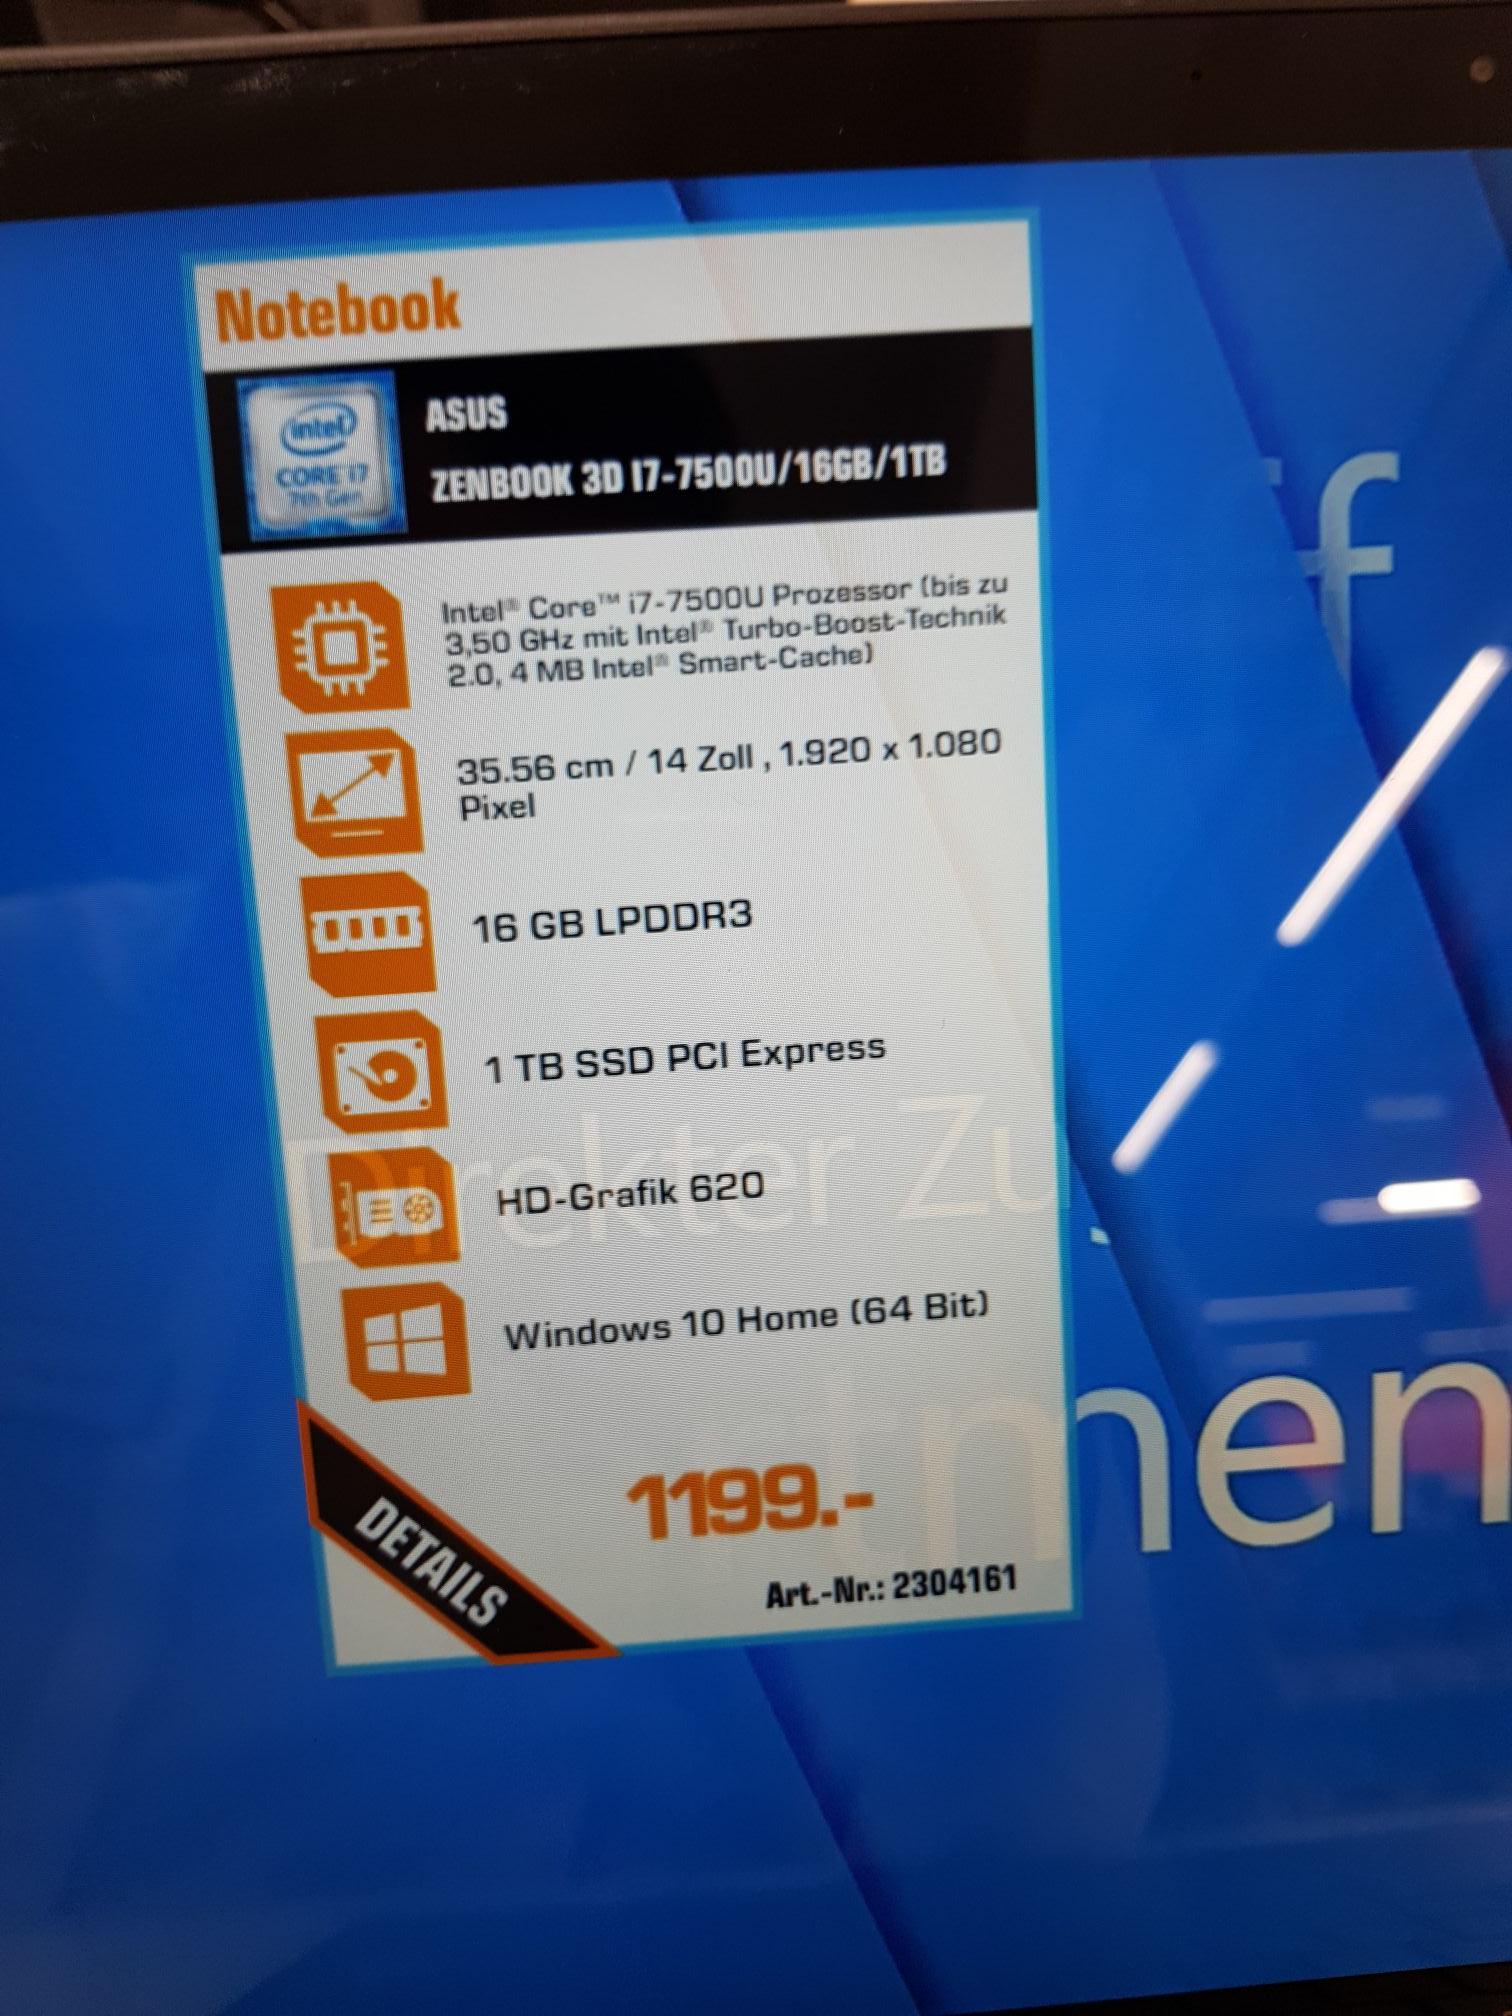 [Köln]Asus Zenbook 3D  für 1199 Euro I7 16 GB 1 TB SSD